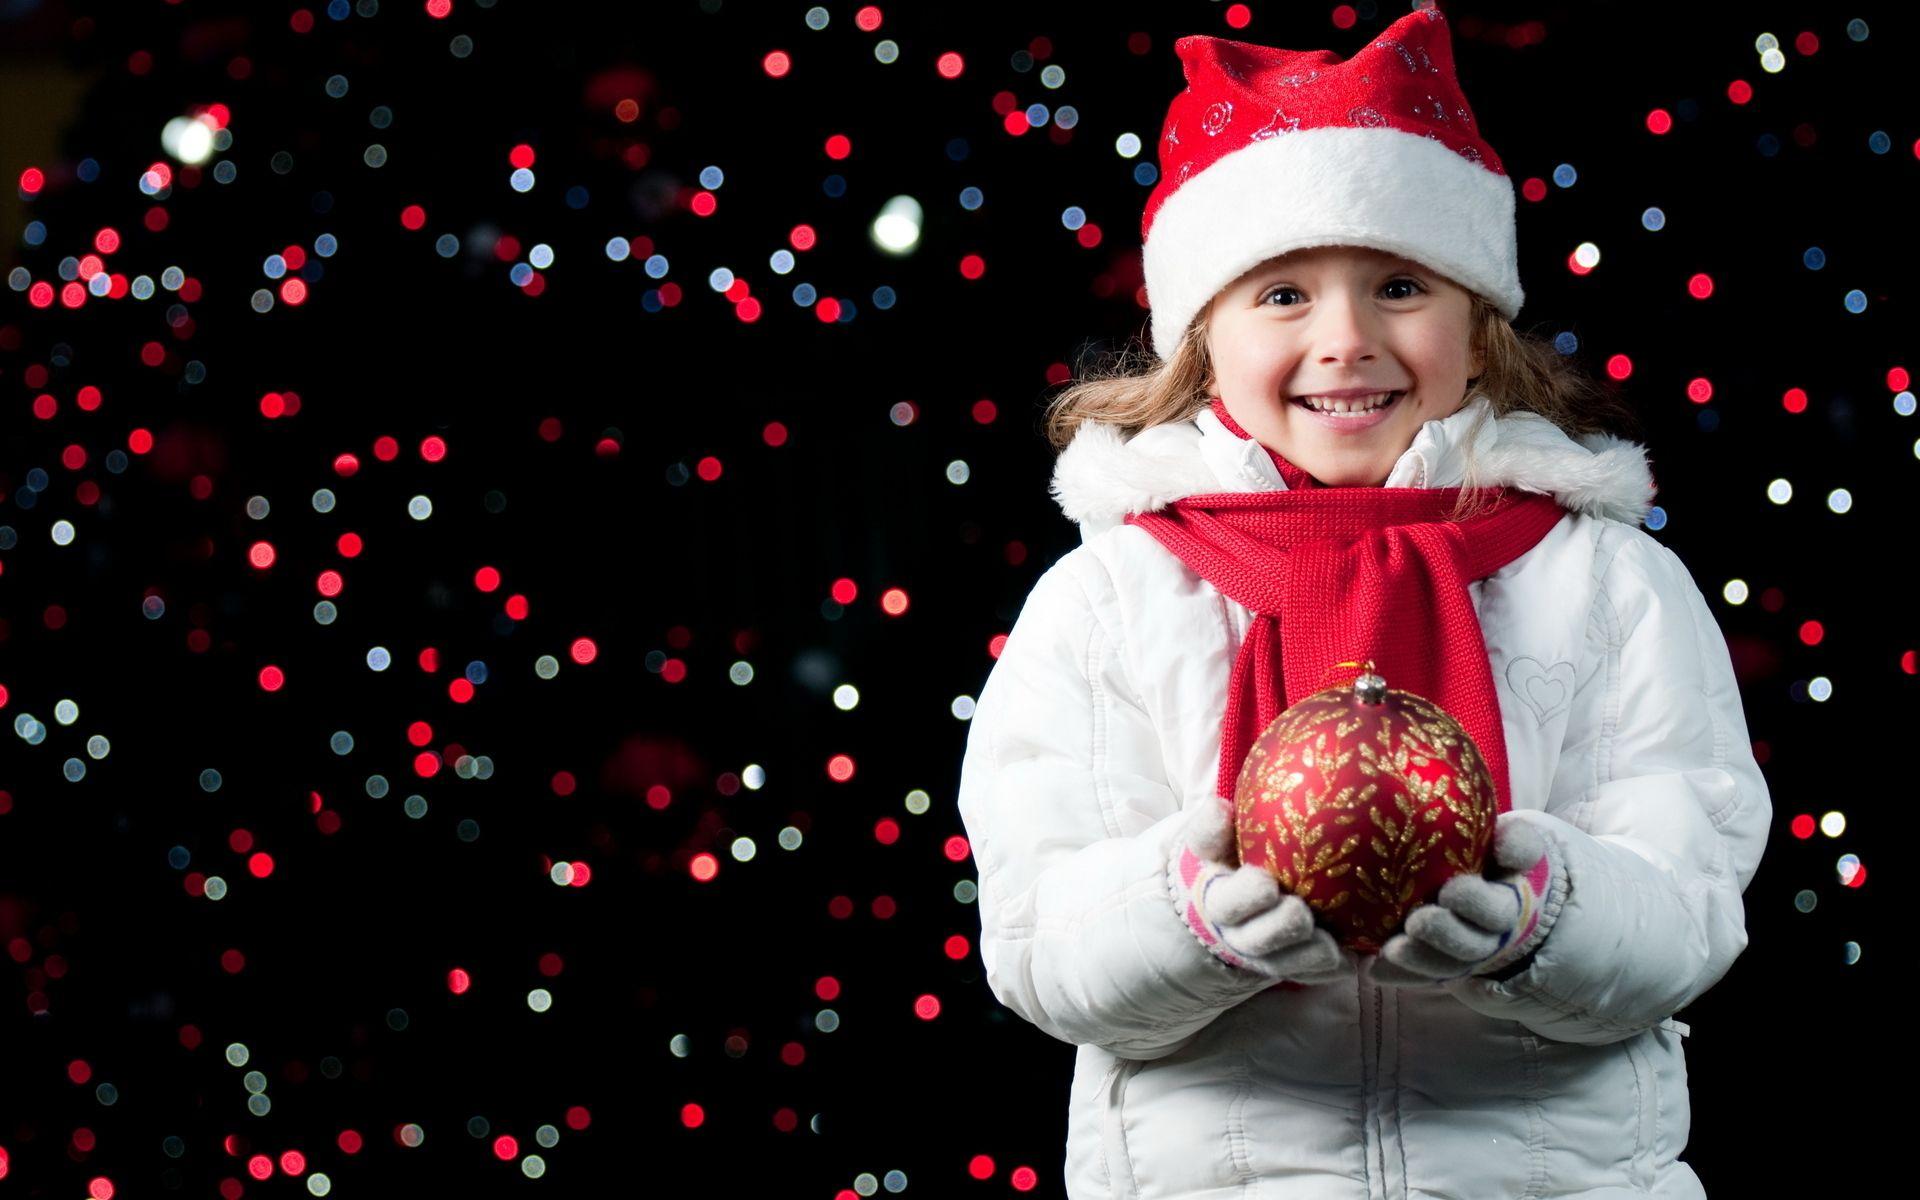 Baby Christmas Pictures Wallpaper DesktopSmile